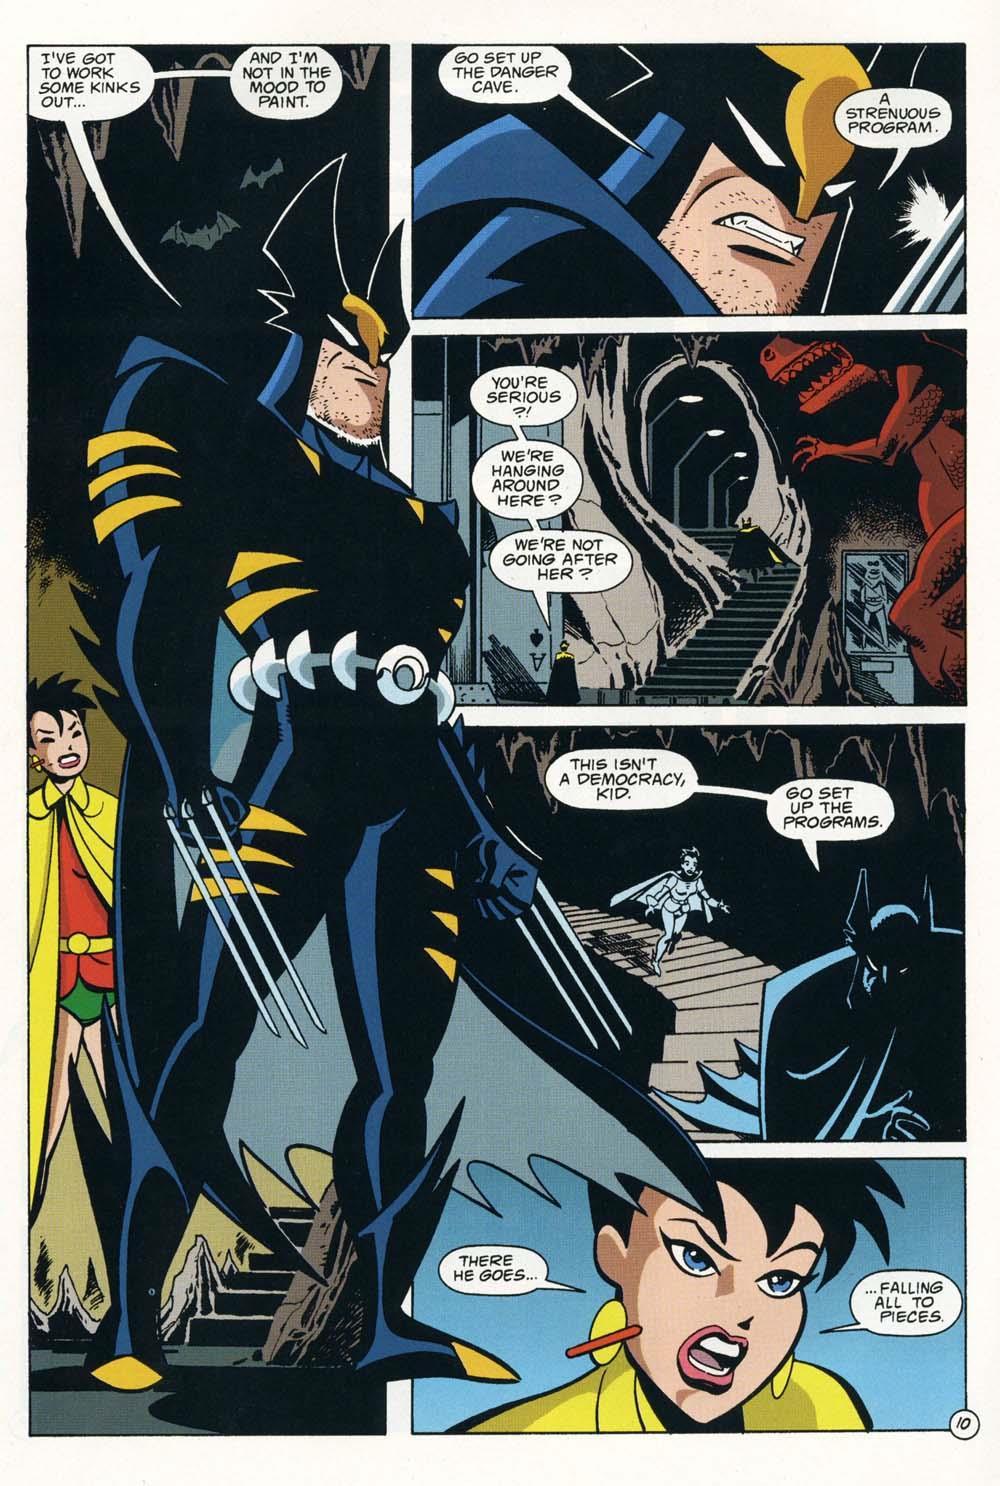 Return to The Amalgam Age of Comics review